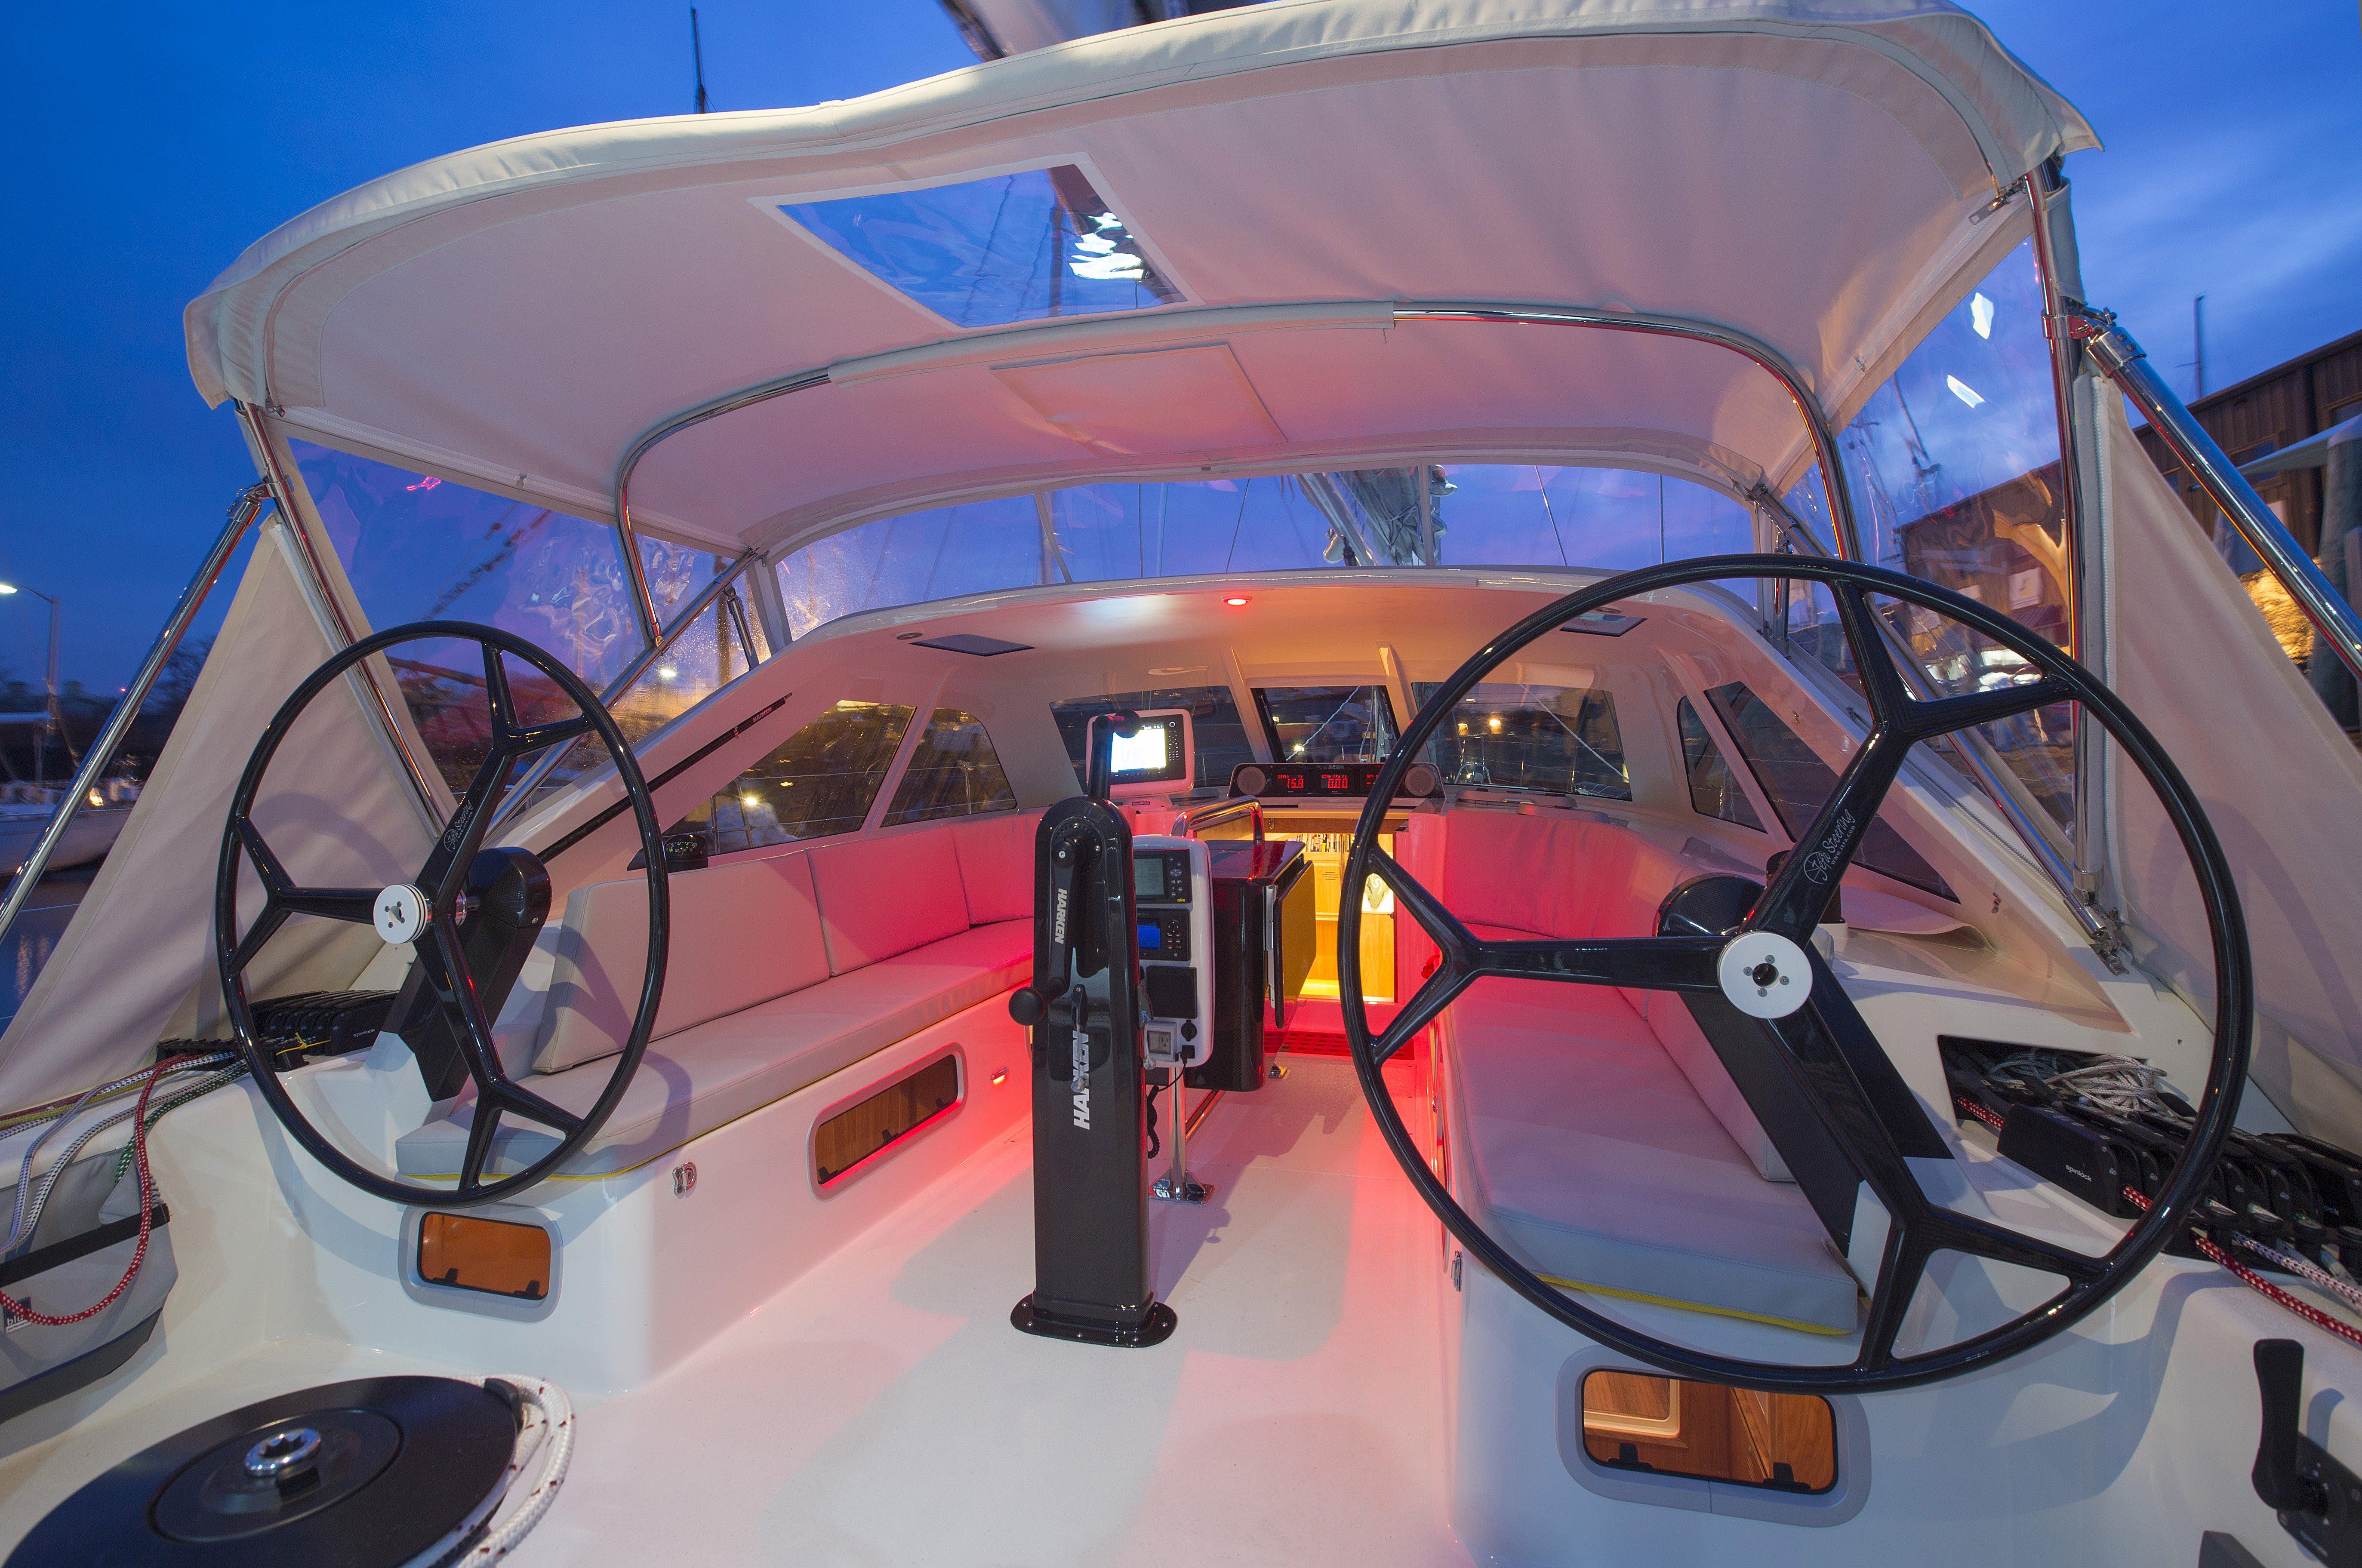 Kiwi Spirit, Far 63 sailing yacht by Lyman-Morse